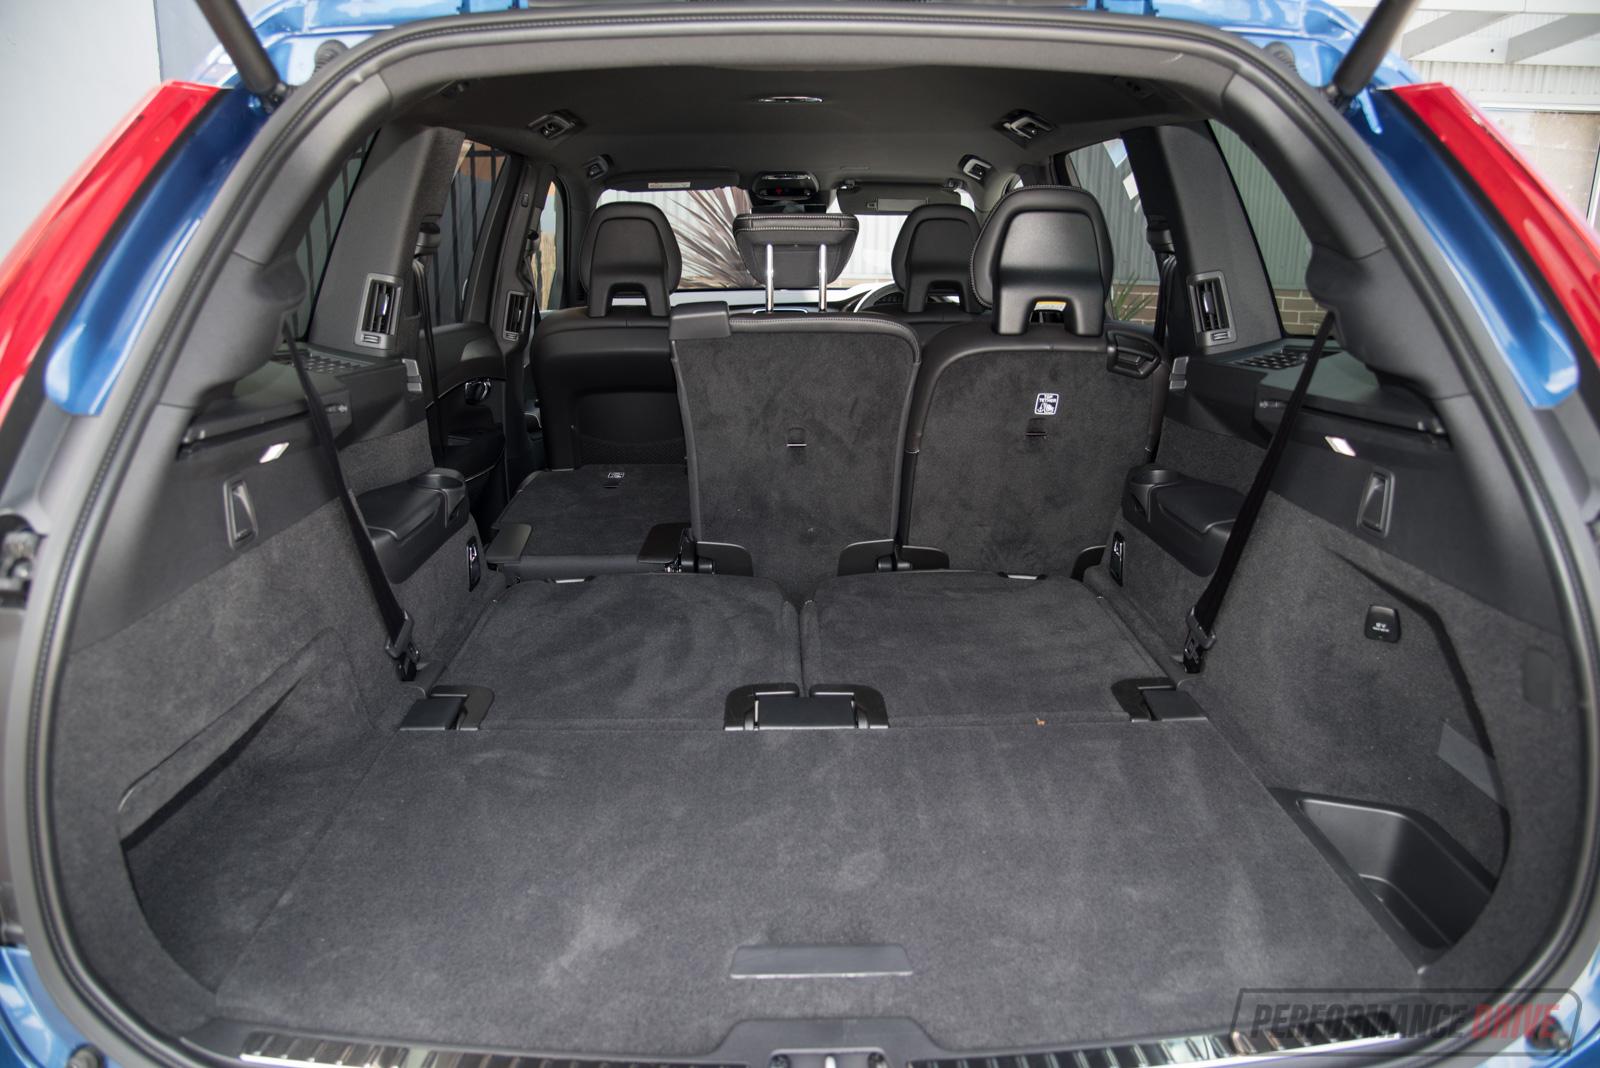 2016 Volvo Xc90 T6 R Design Polestar Review Video